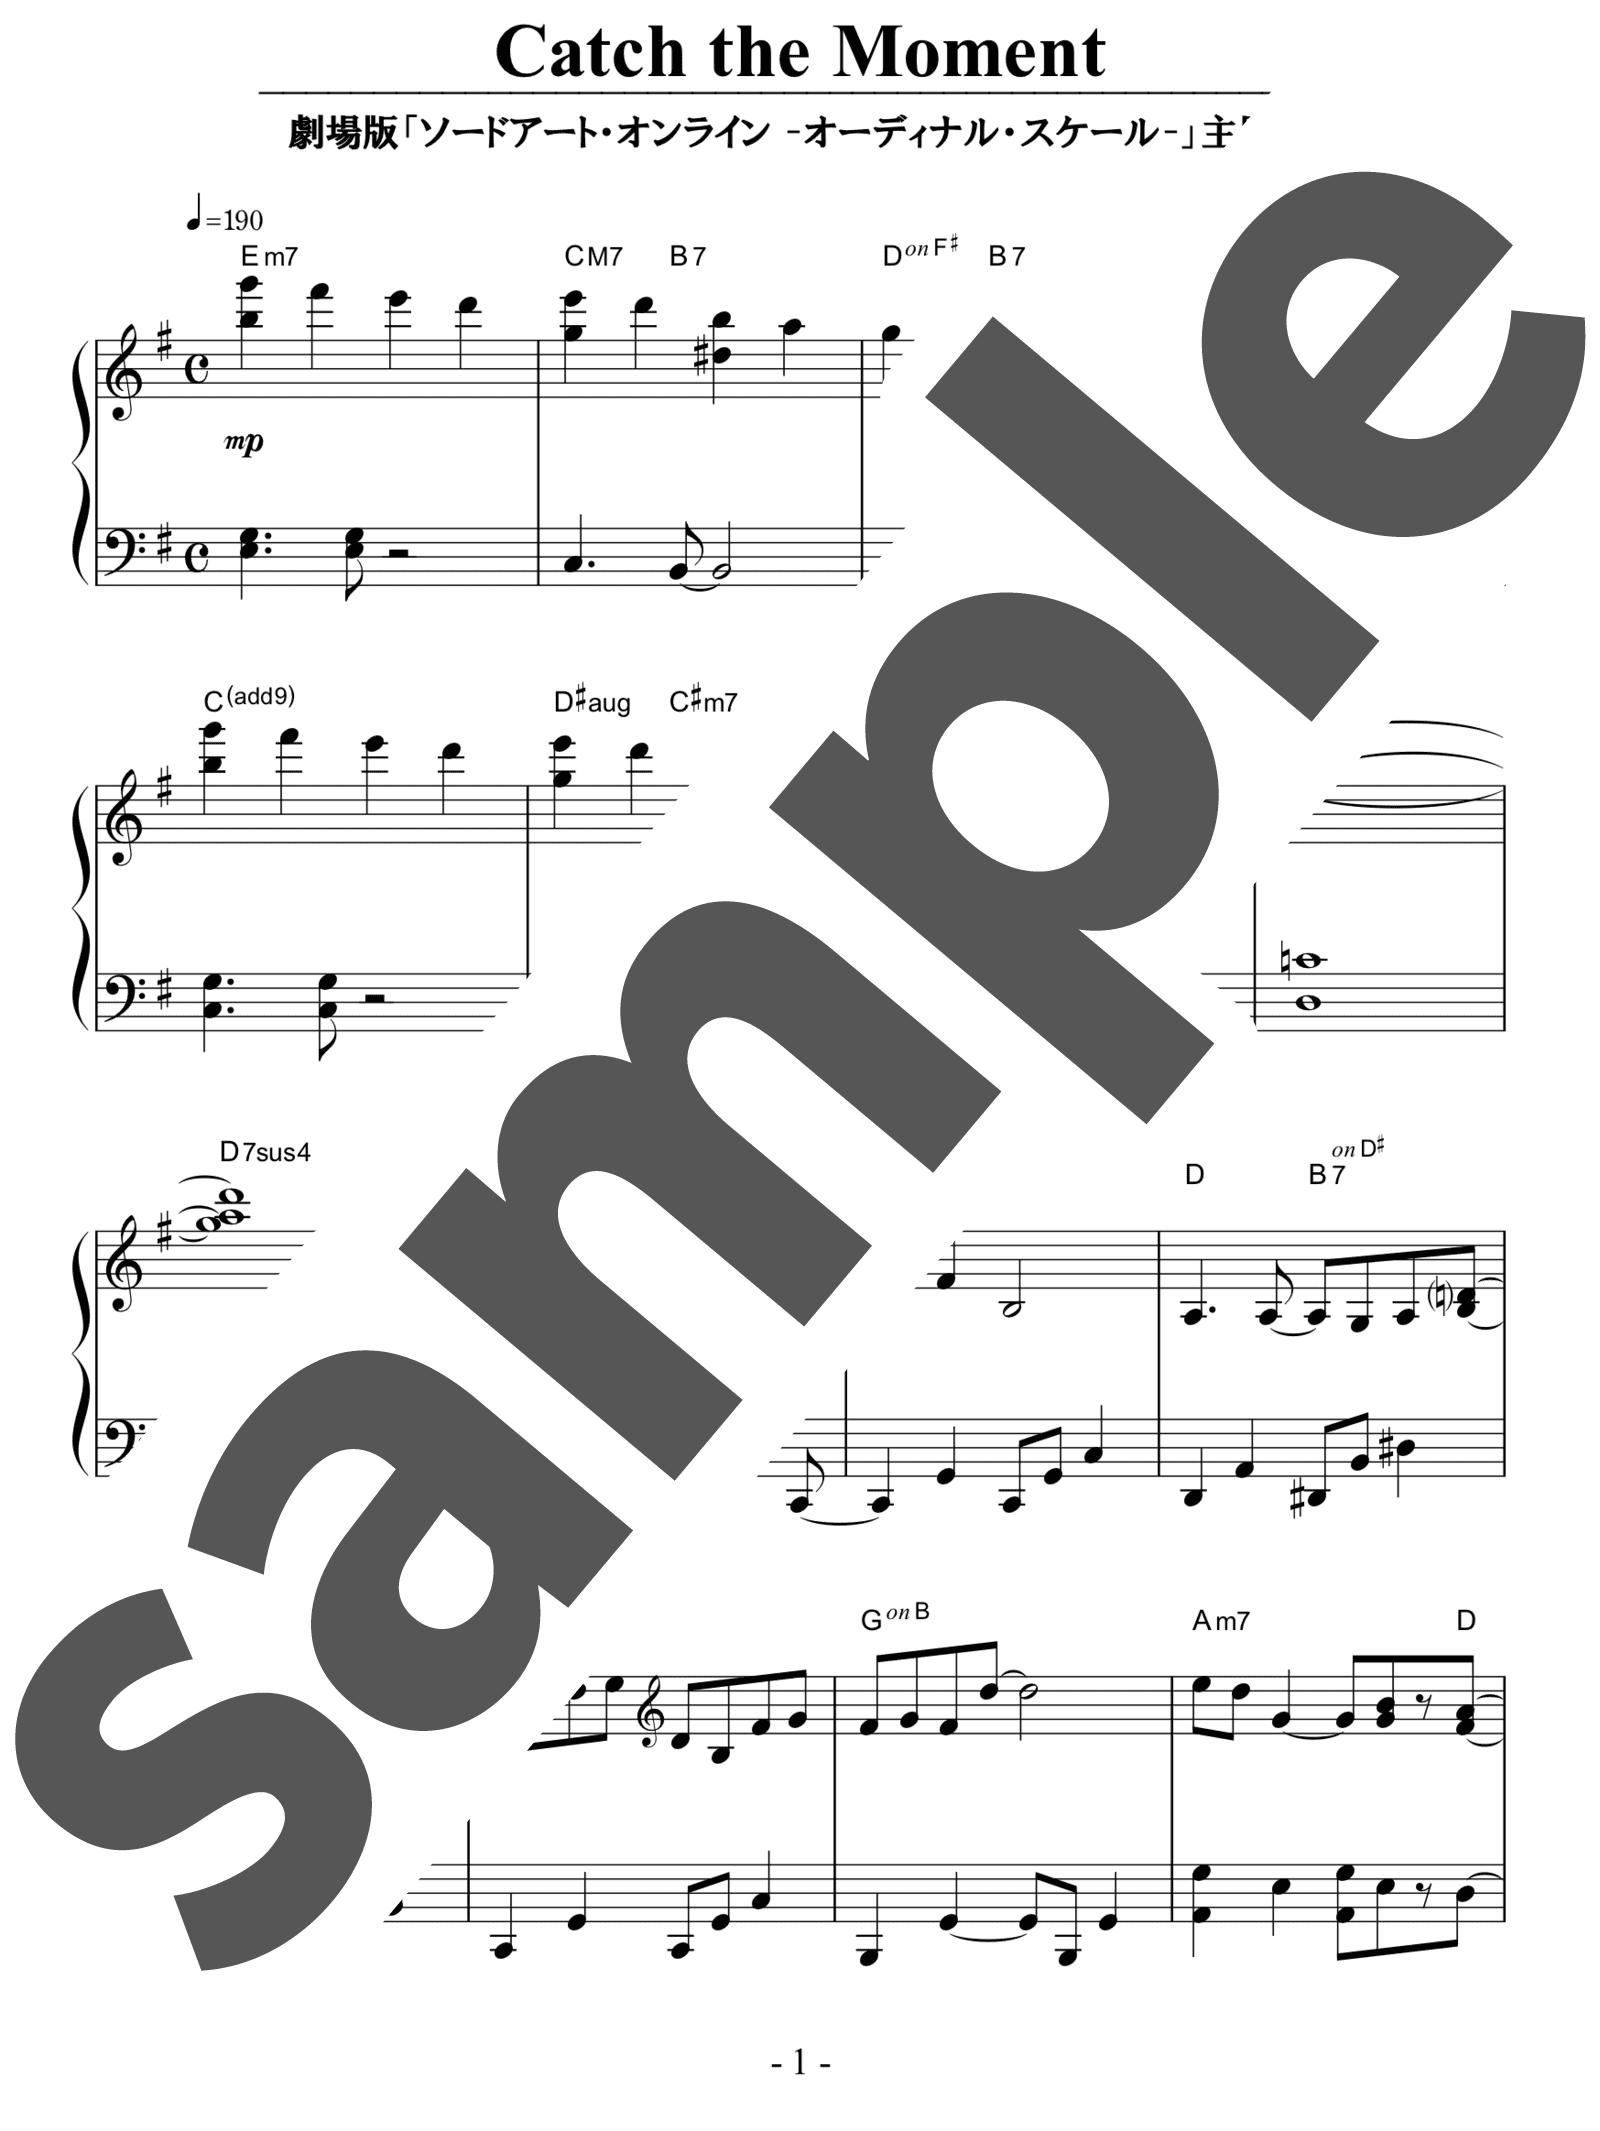 「Catch the Moment」のサンプル楽譜